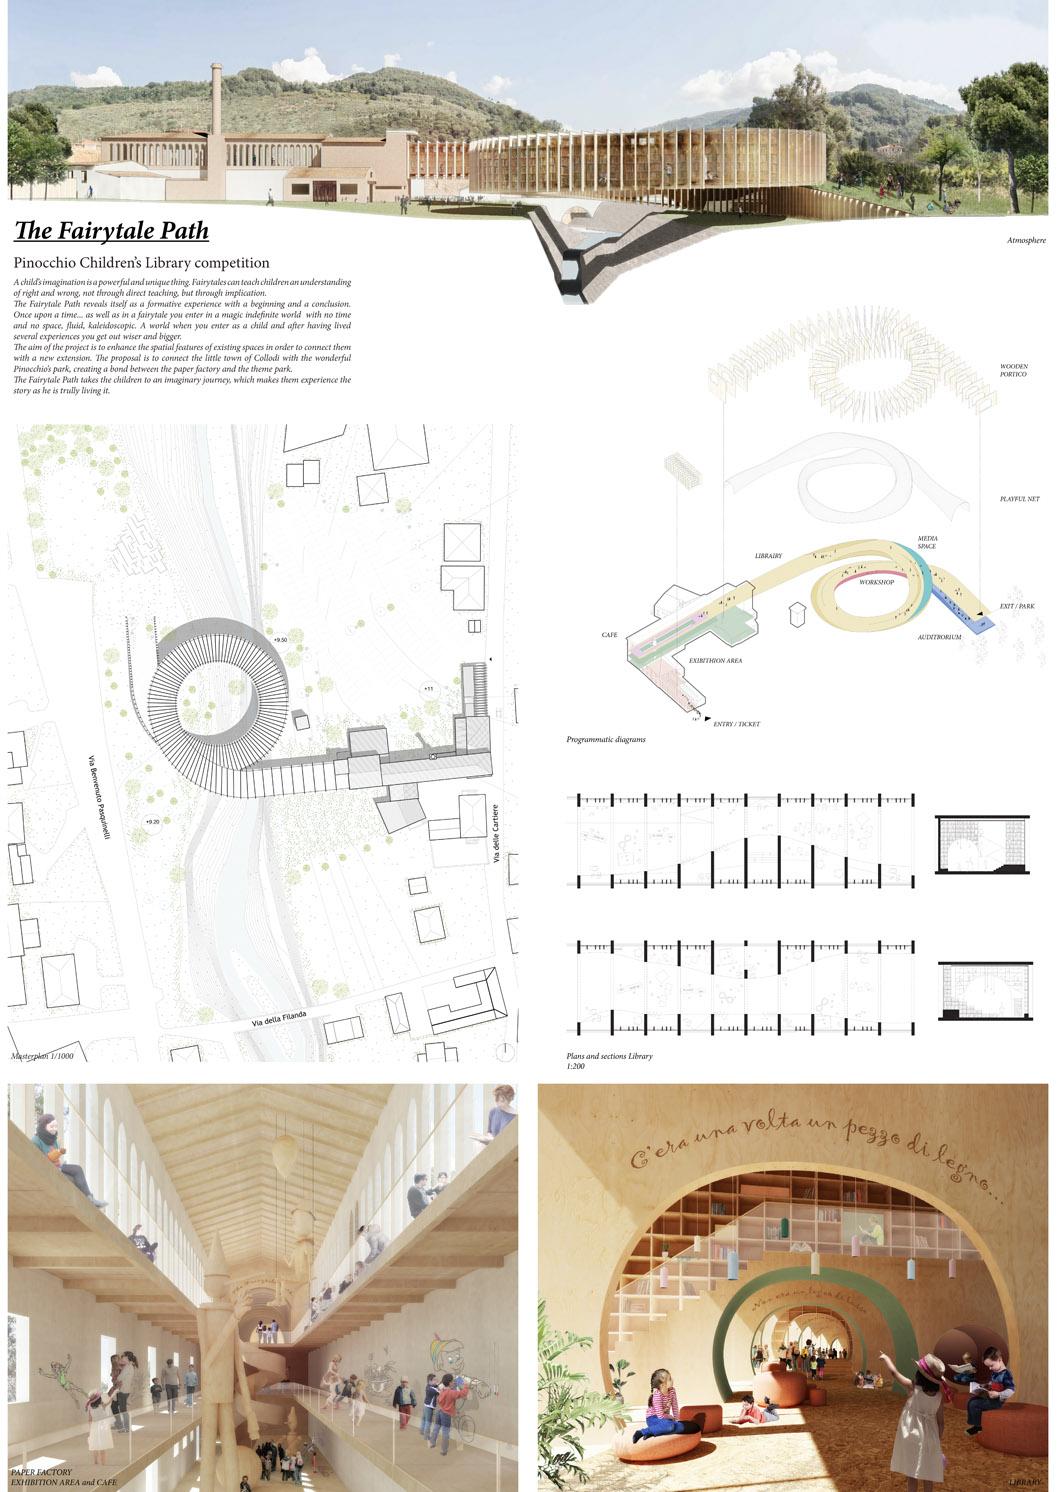 Children's Library architecture competition board winner